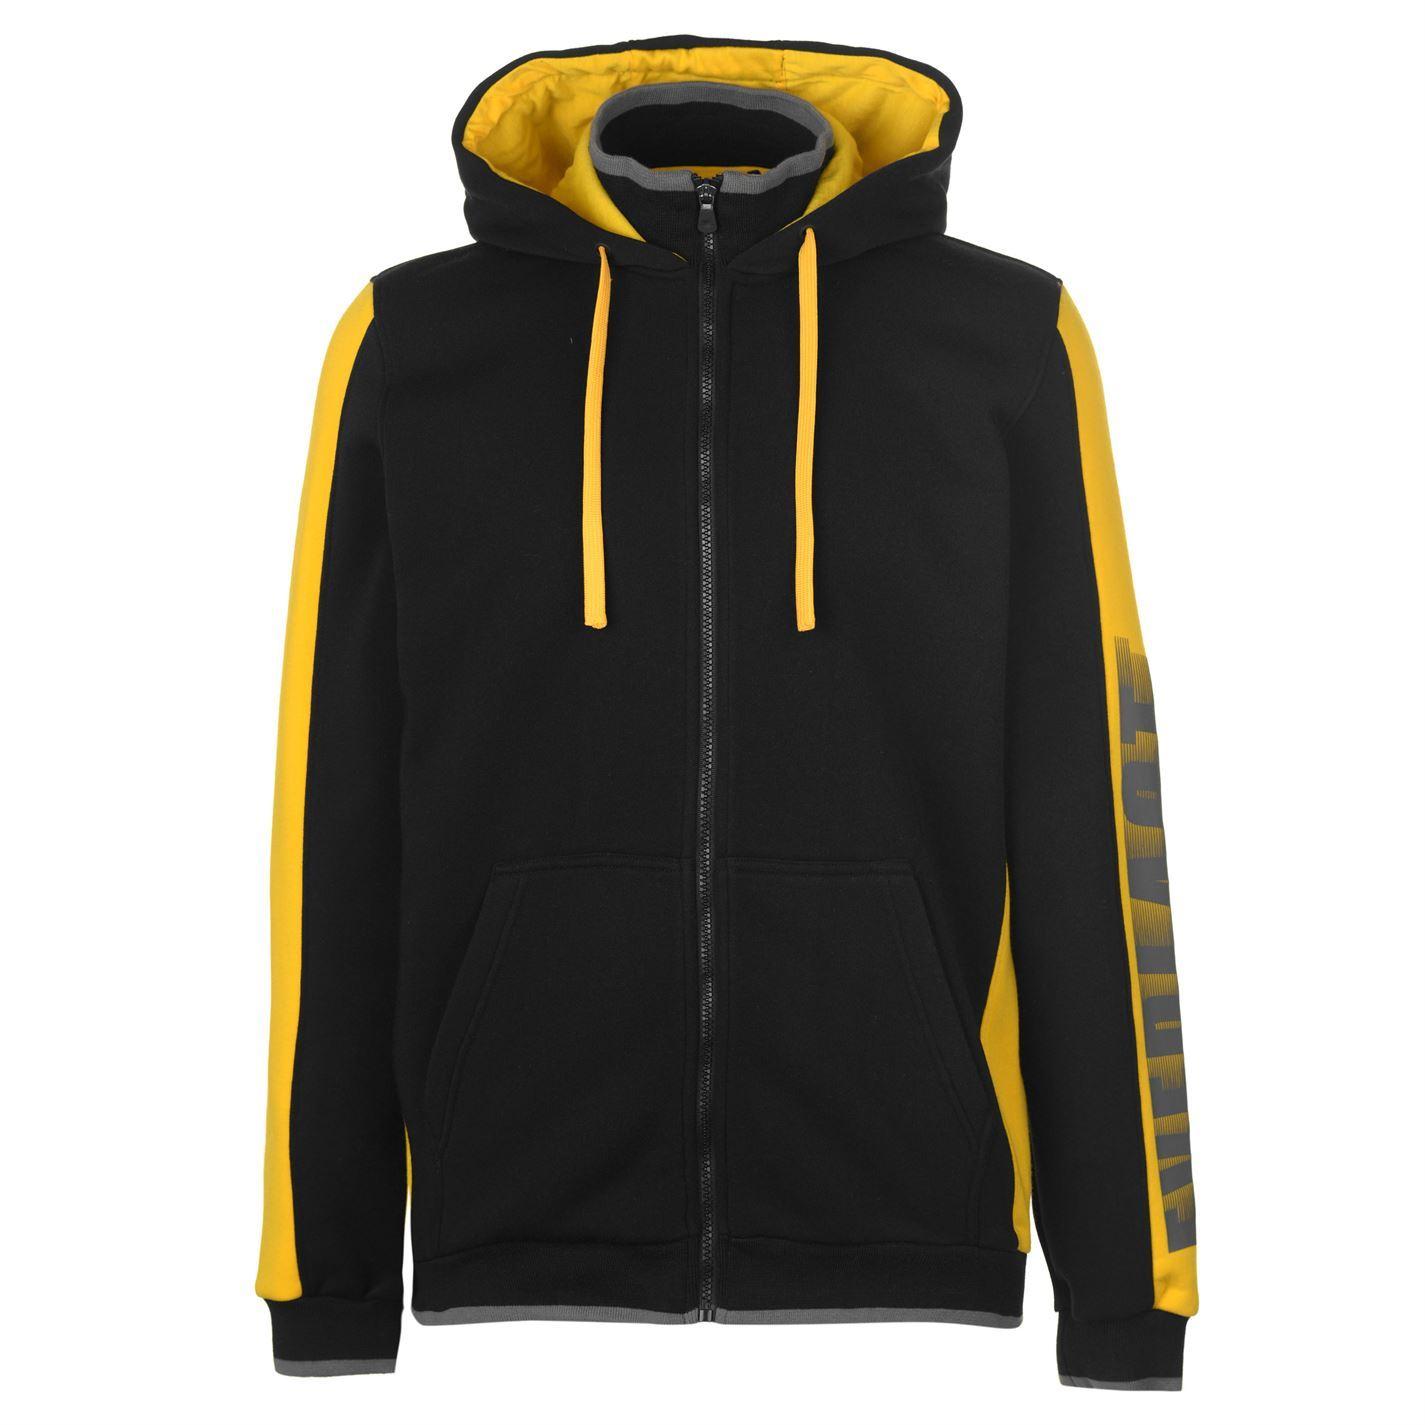 Everlast Plush Fleece Full Zip Hoody Mens Hoodie Top Sweatshirt Sweater